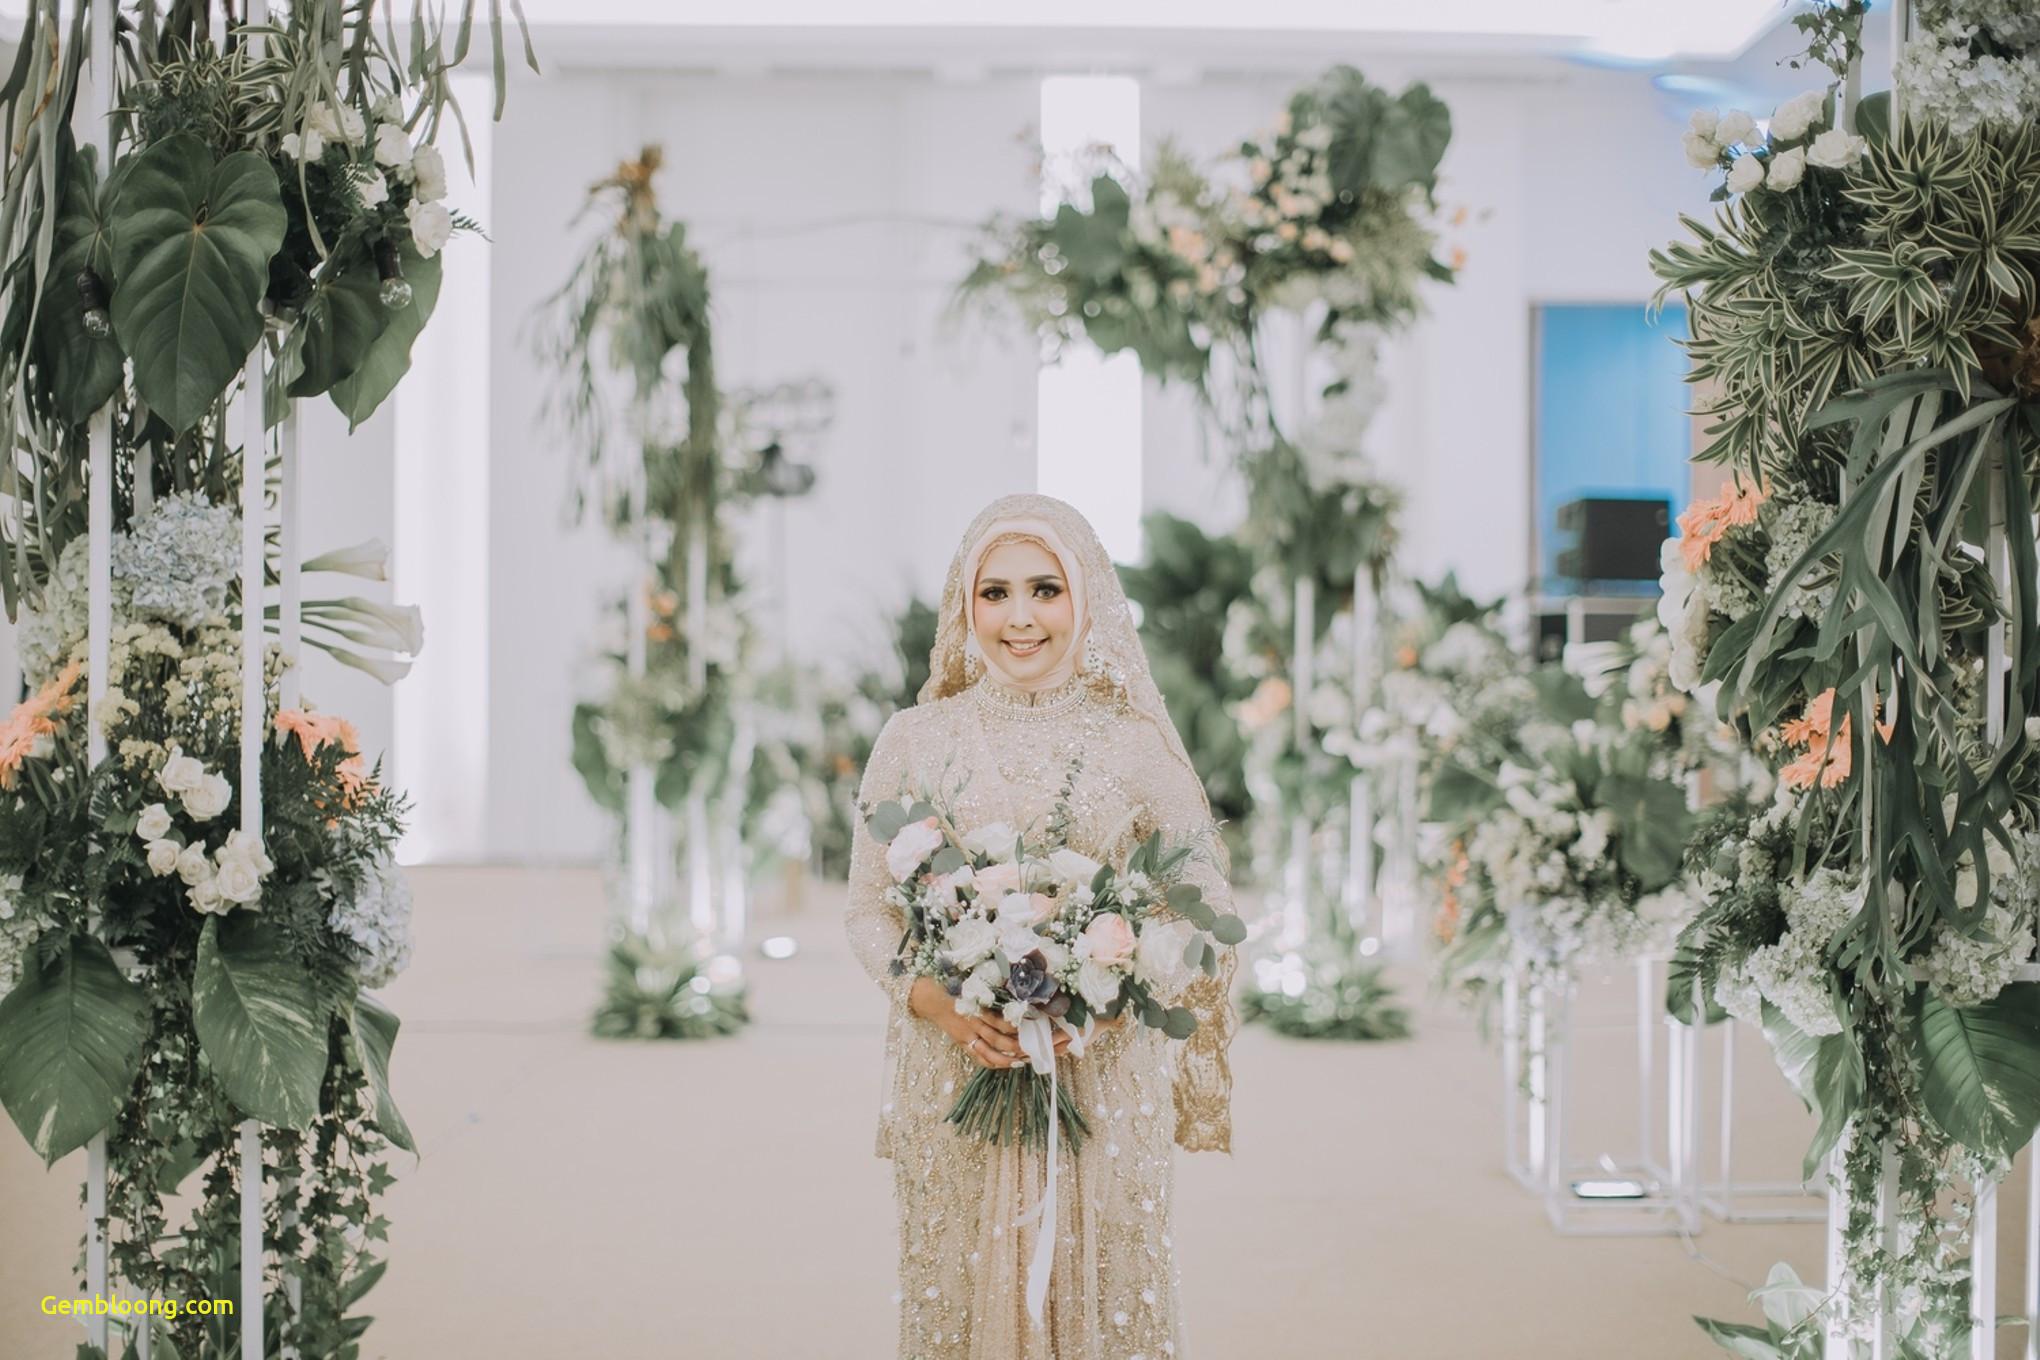 Gaun Sederhana Pengantin Berhijab Beautiful 20 Inspirasi Gaun Pernikahan Untuk Calon Pengantin Berhijab